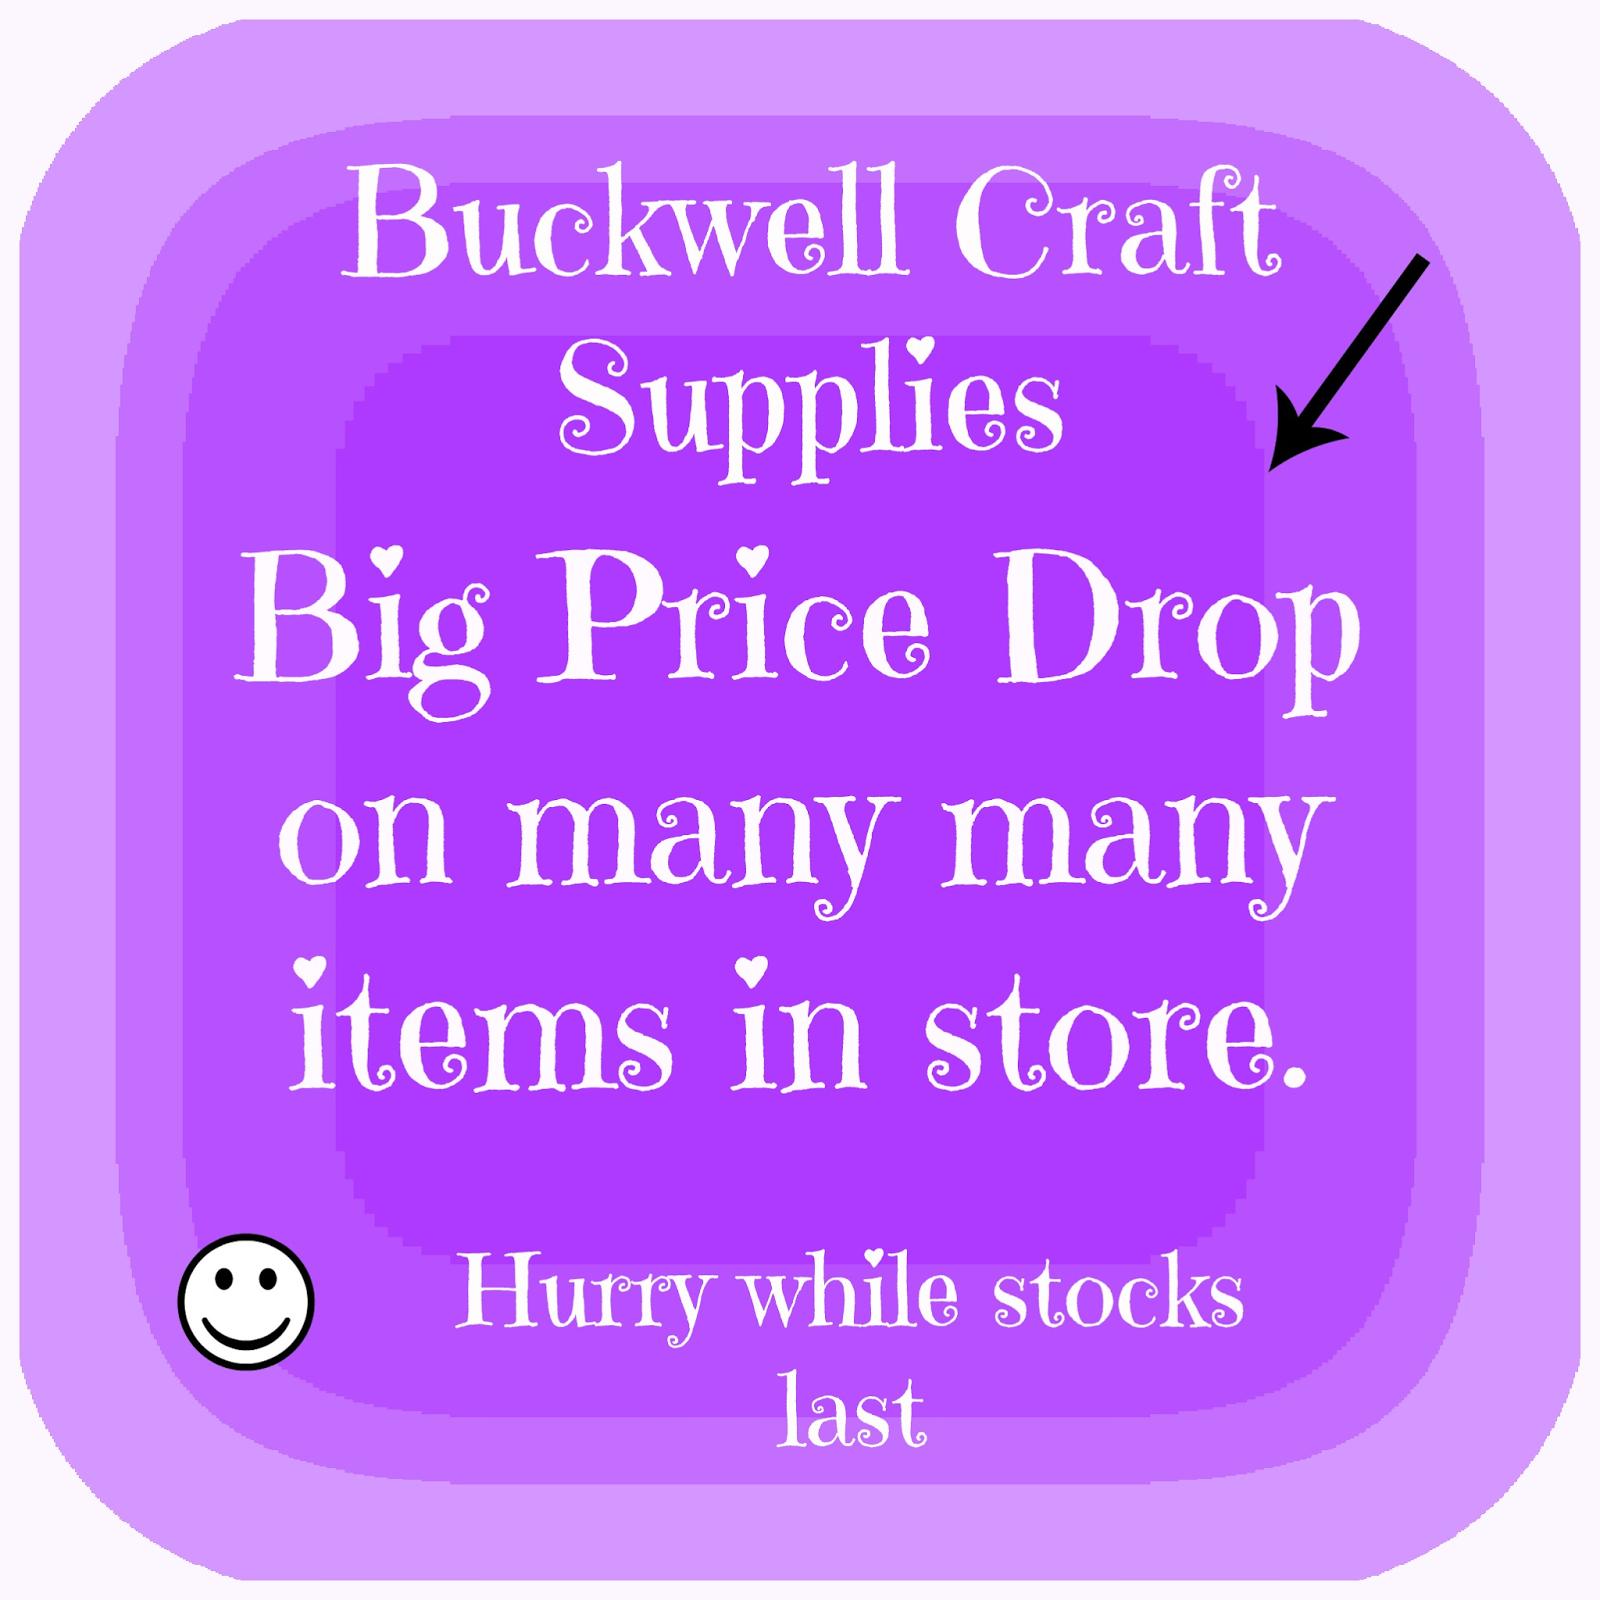 Great bargin price drop at Buckwells Craft supplies